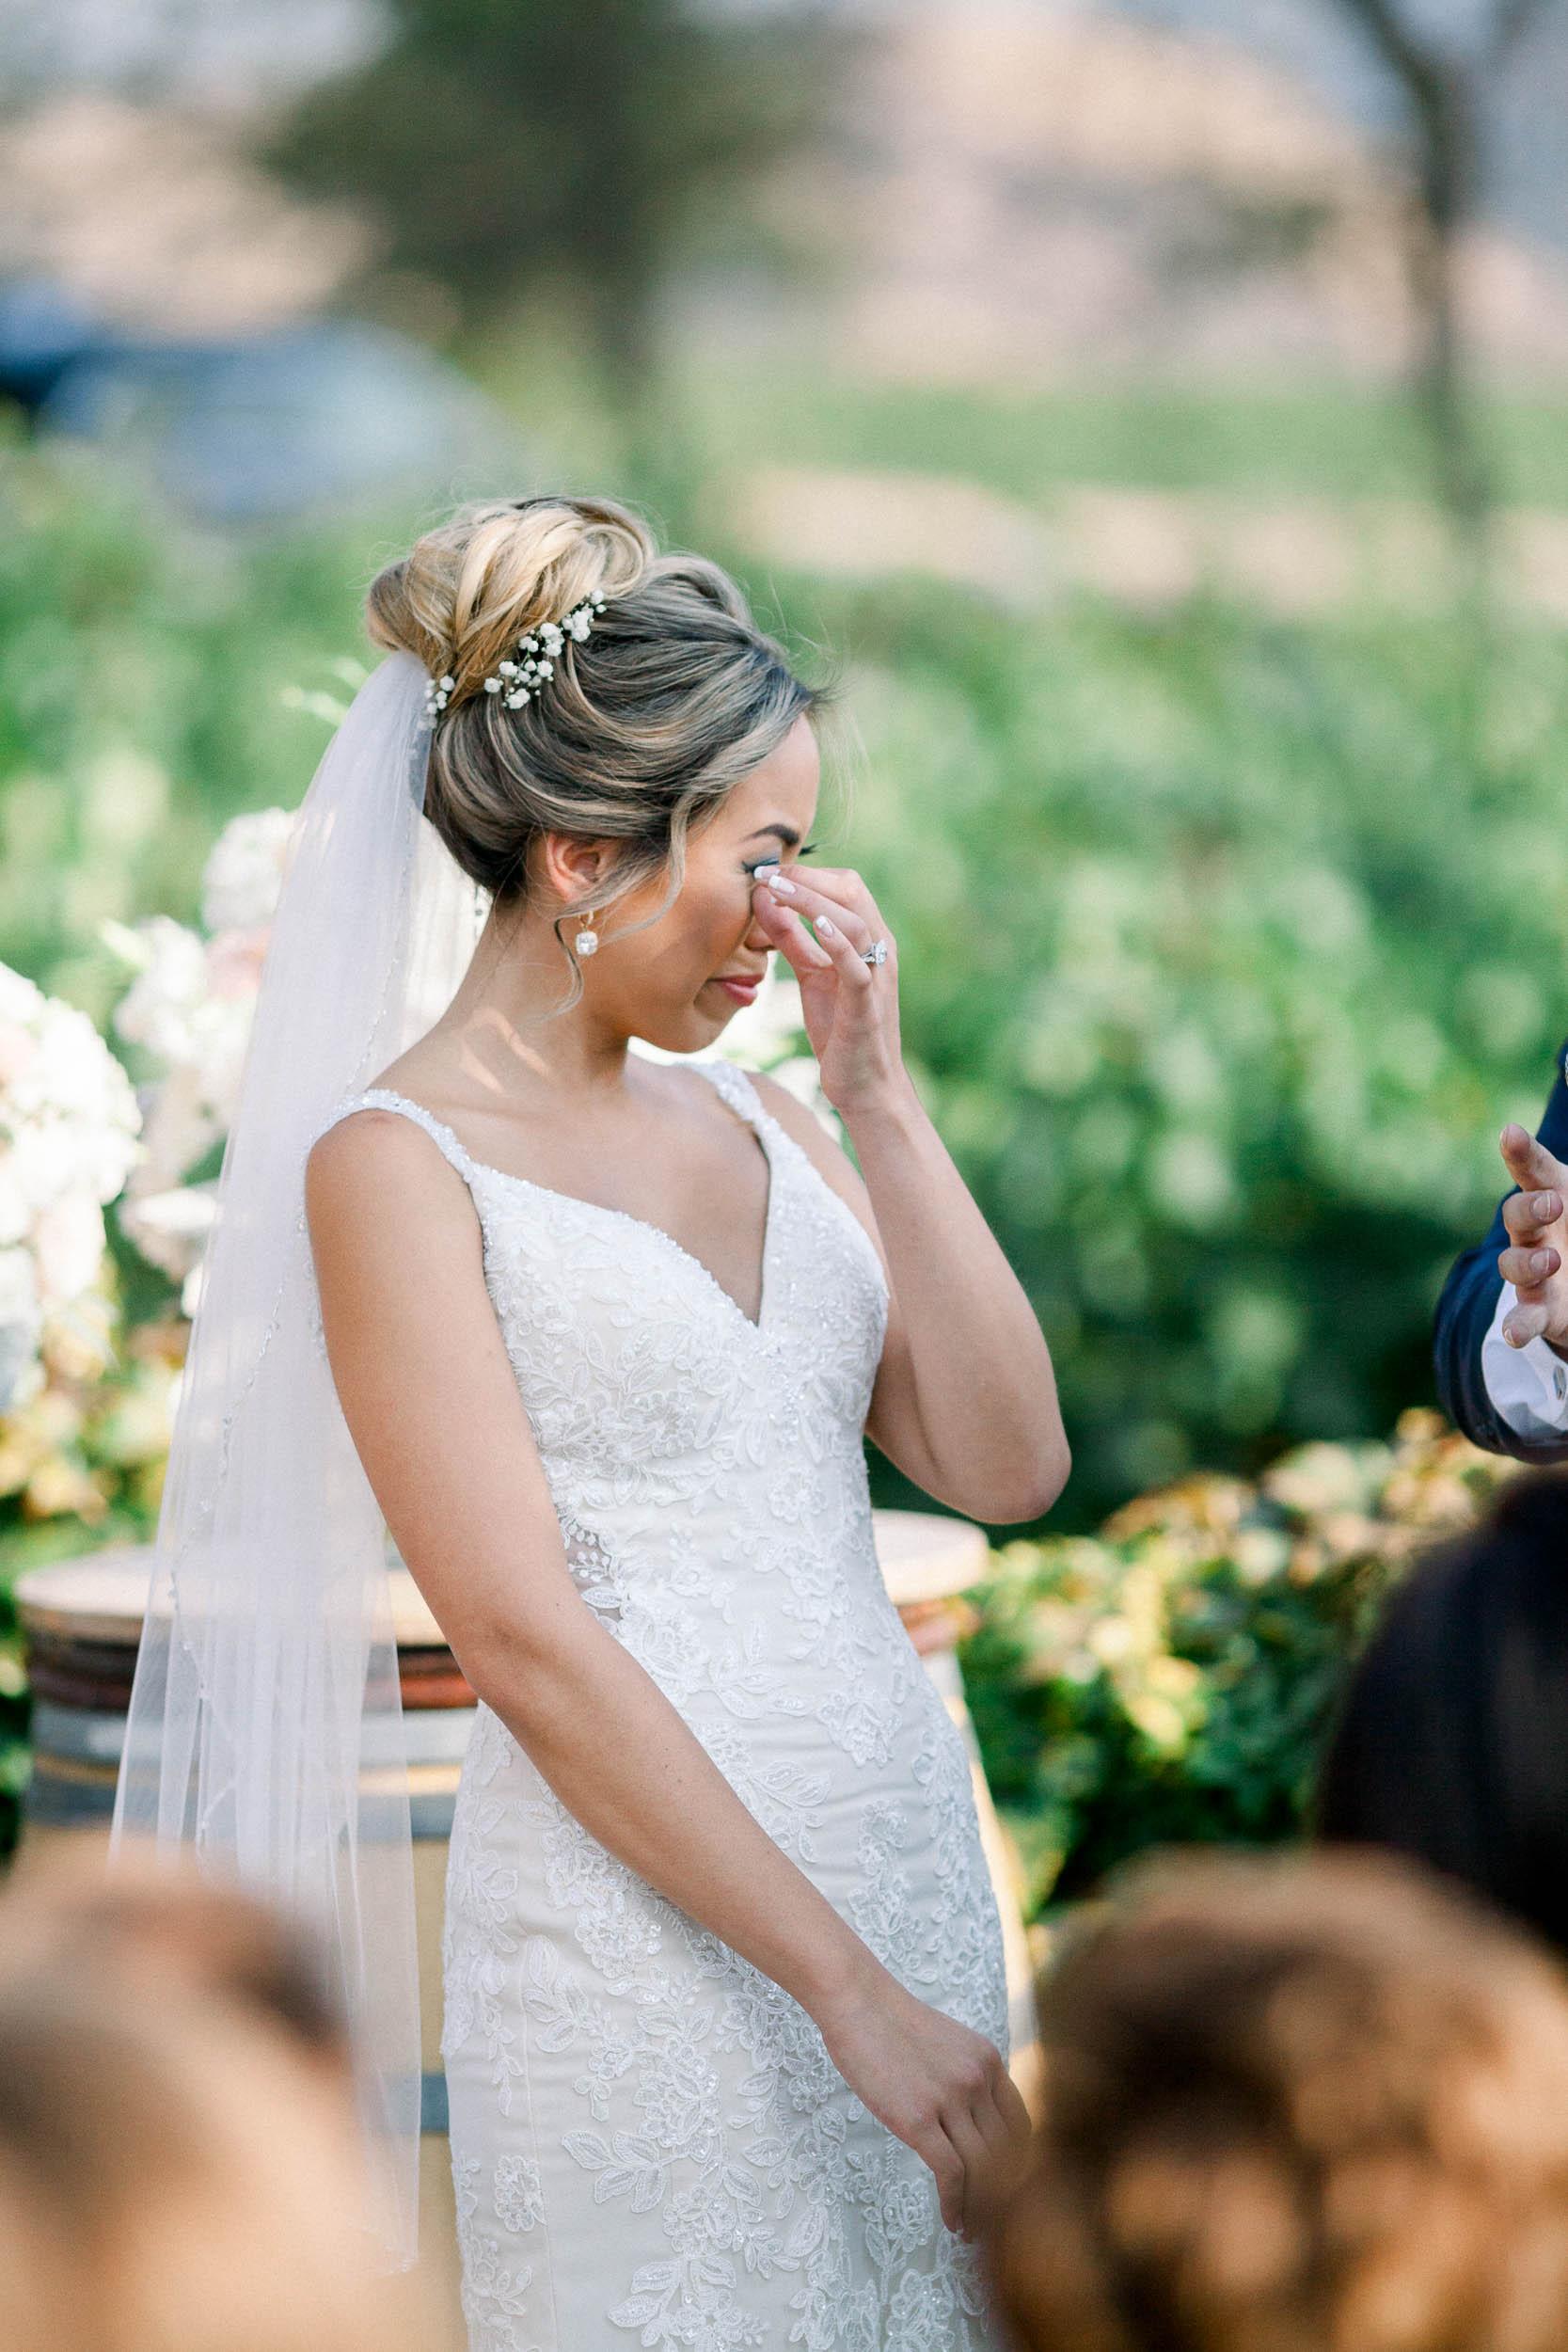 Las Positas Wedding_Buena Lane Photography_090118ER442.jpg